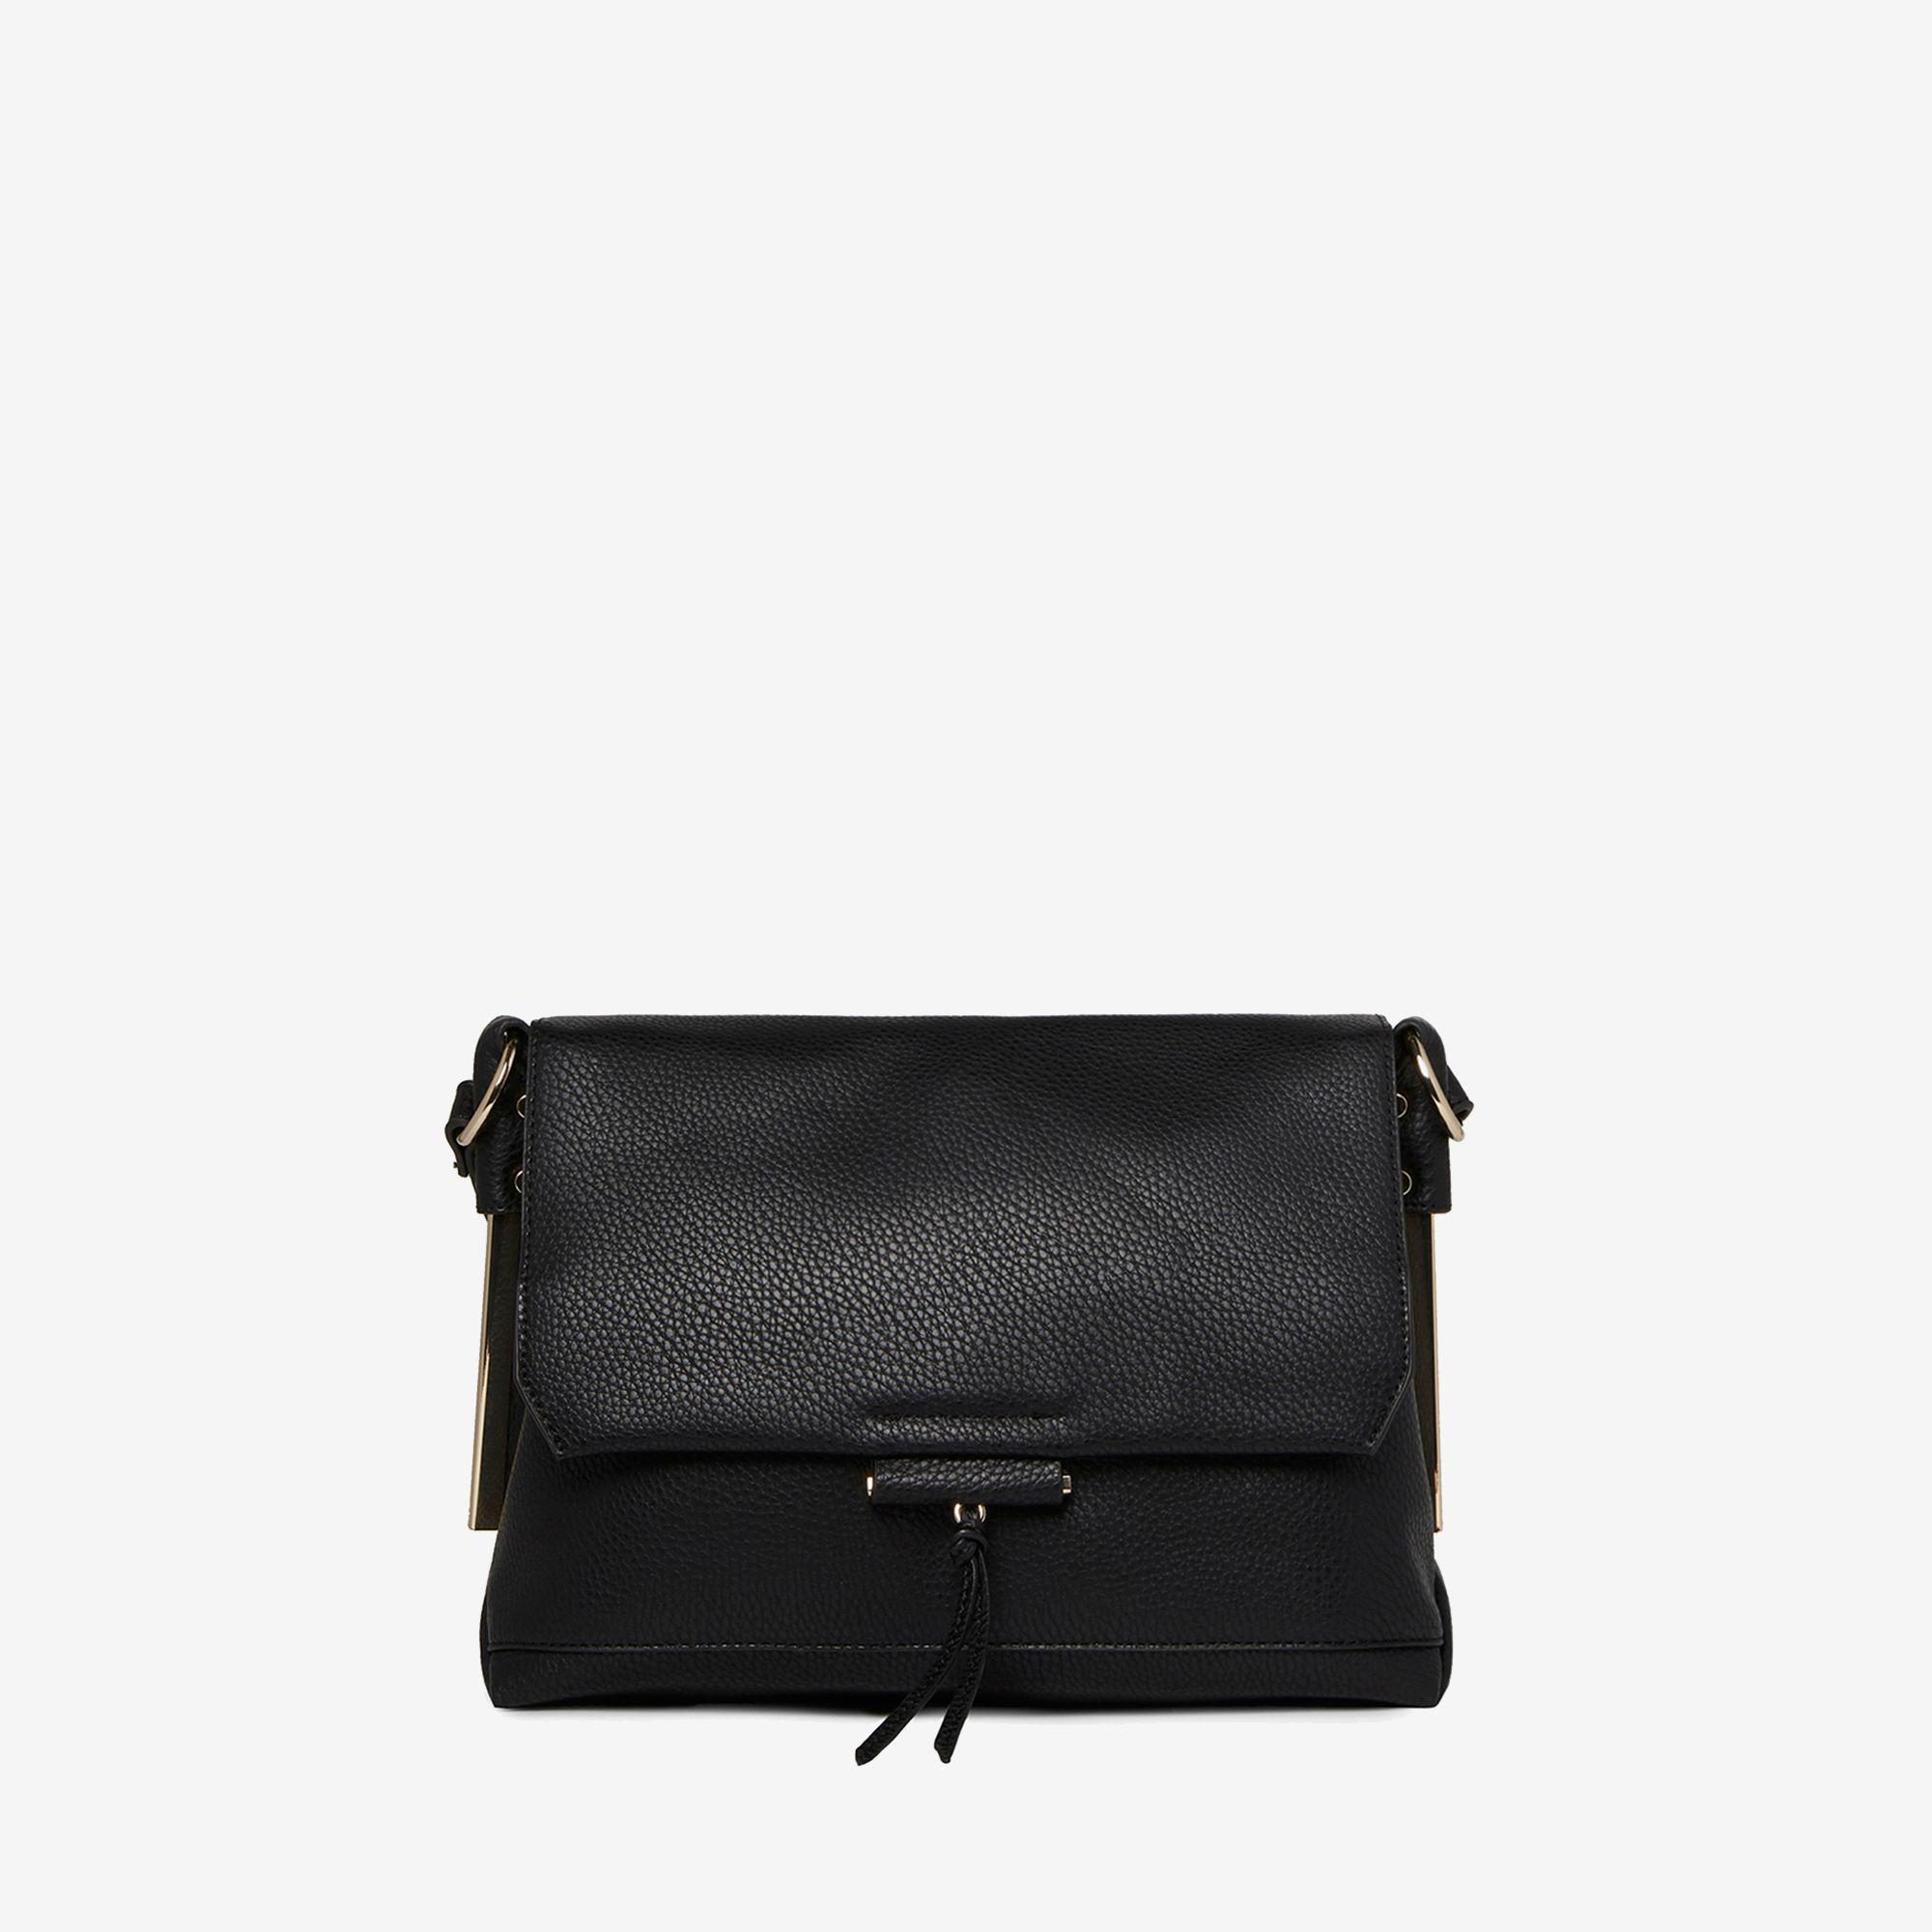 Dorothy Perkins Black Metal Side Cross Body Bag in Black - Save 32 ... 4982b6f3d48f5